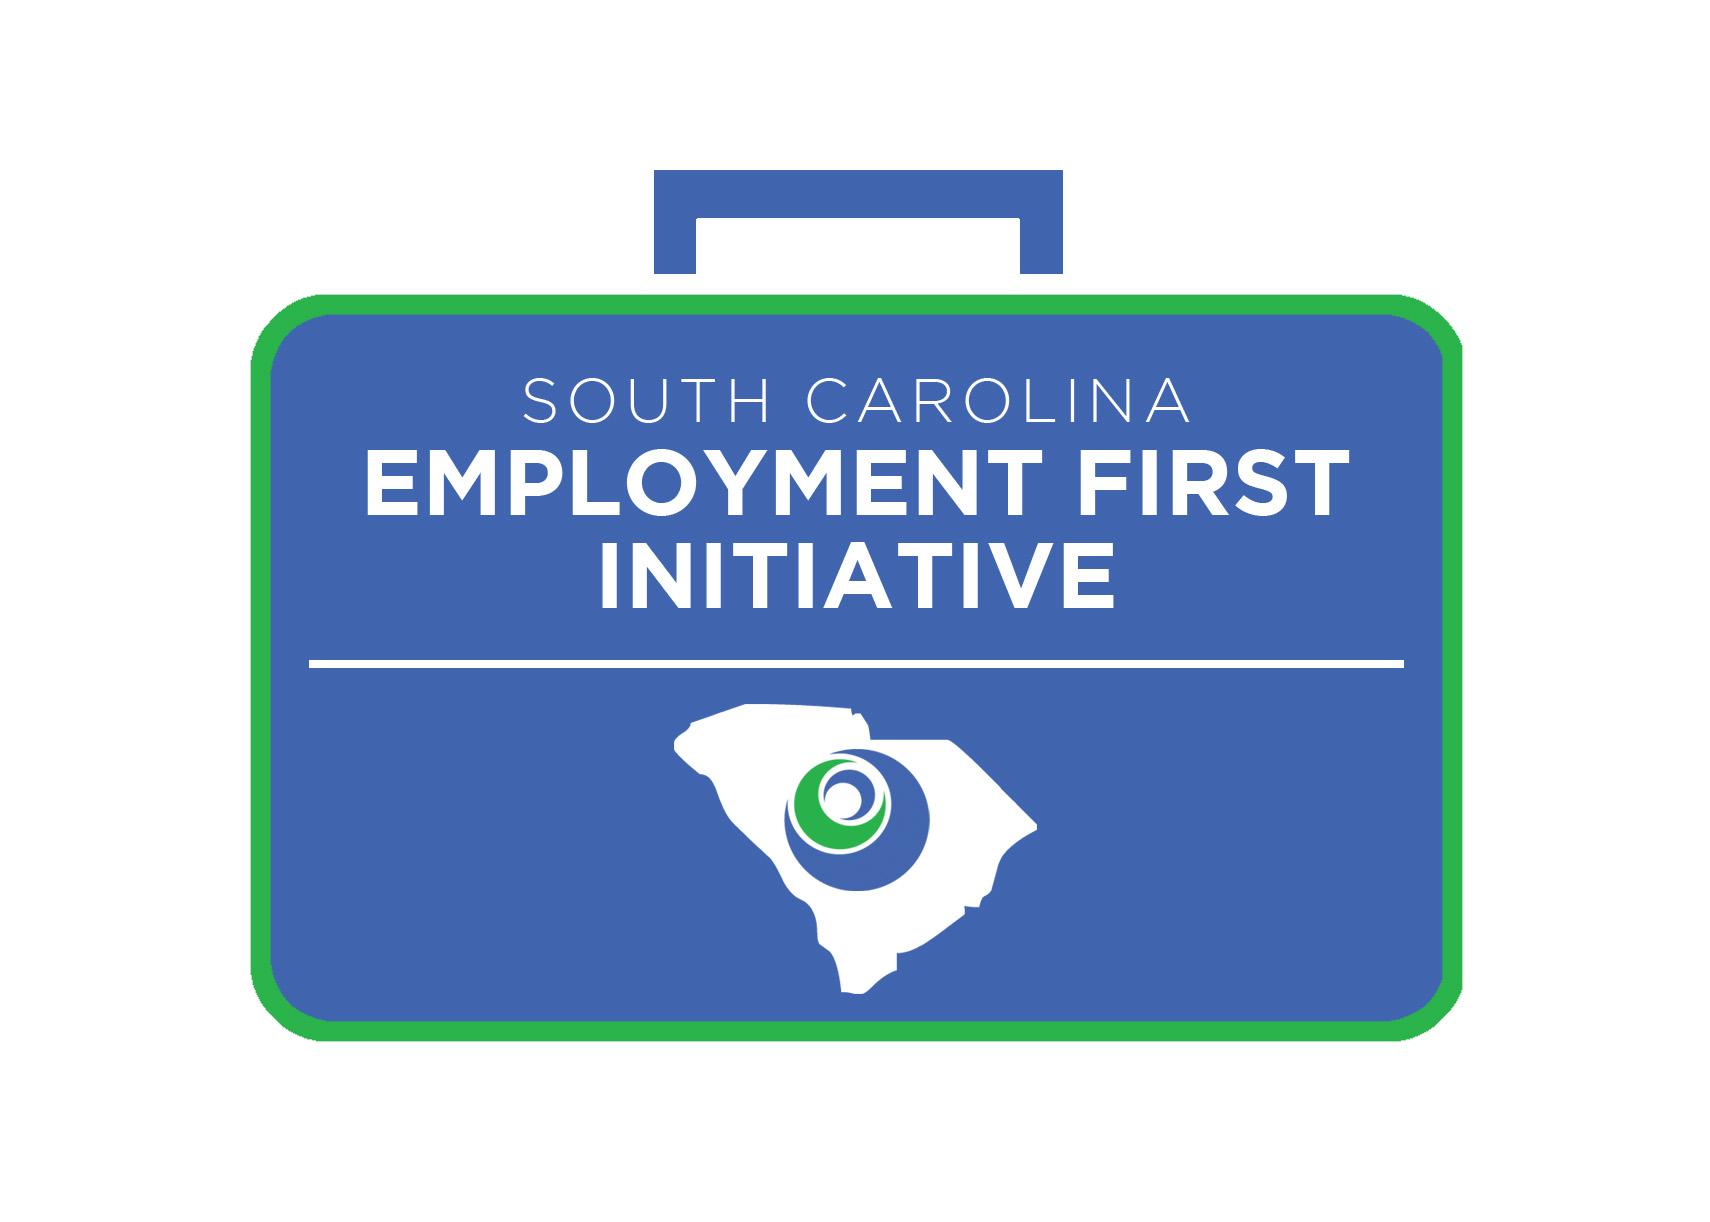 Employment First Initiative logo in a blue suitcase